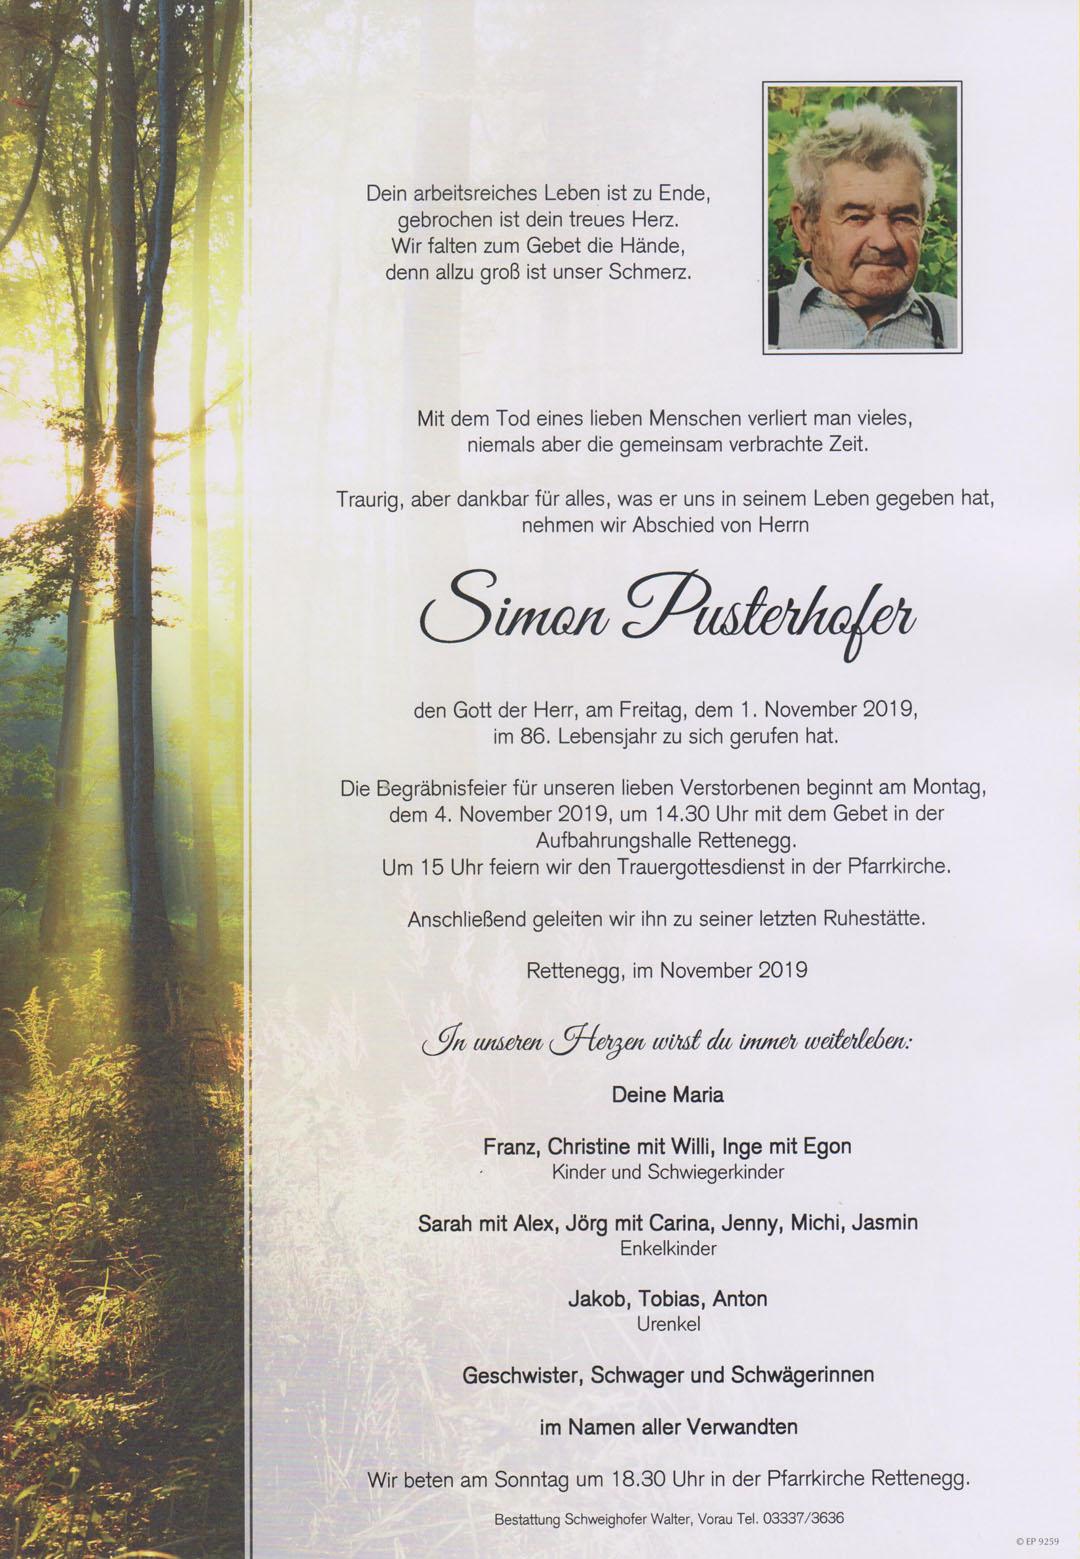 Simon Pusterhofer